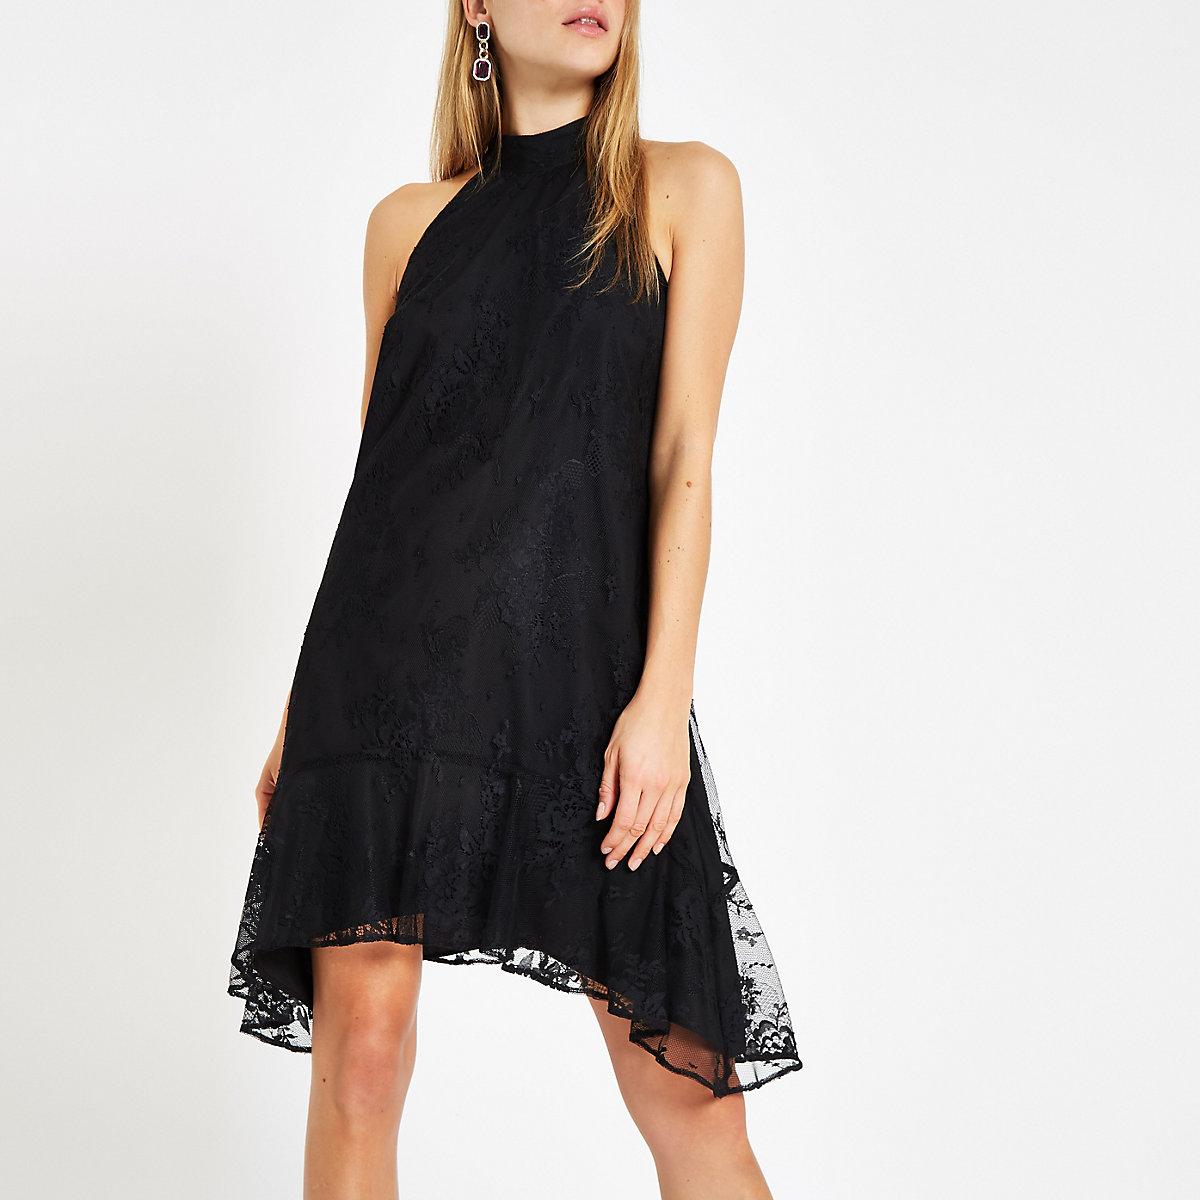 Black lace halter neck swing dress